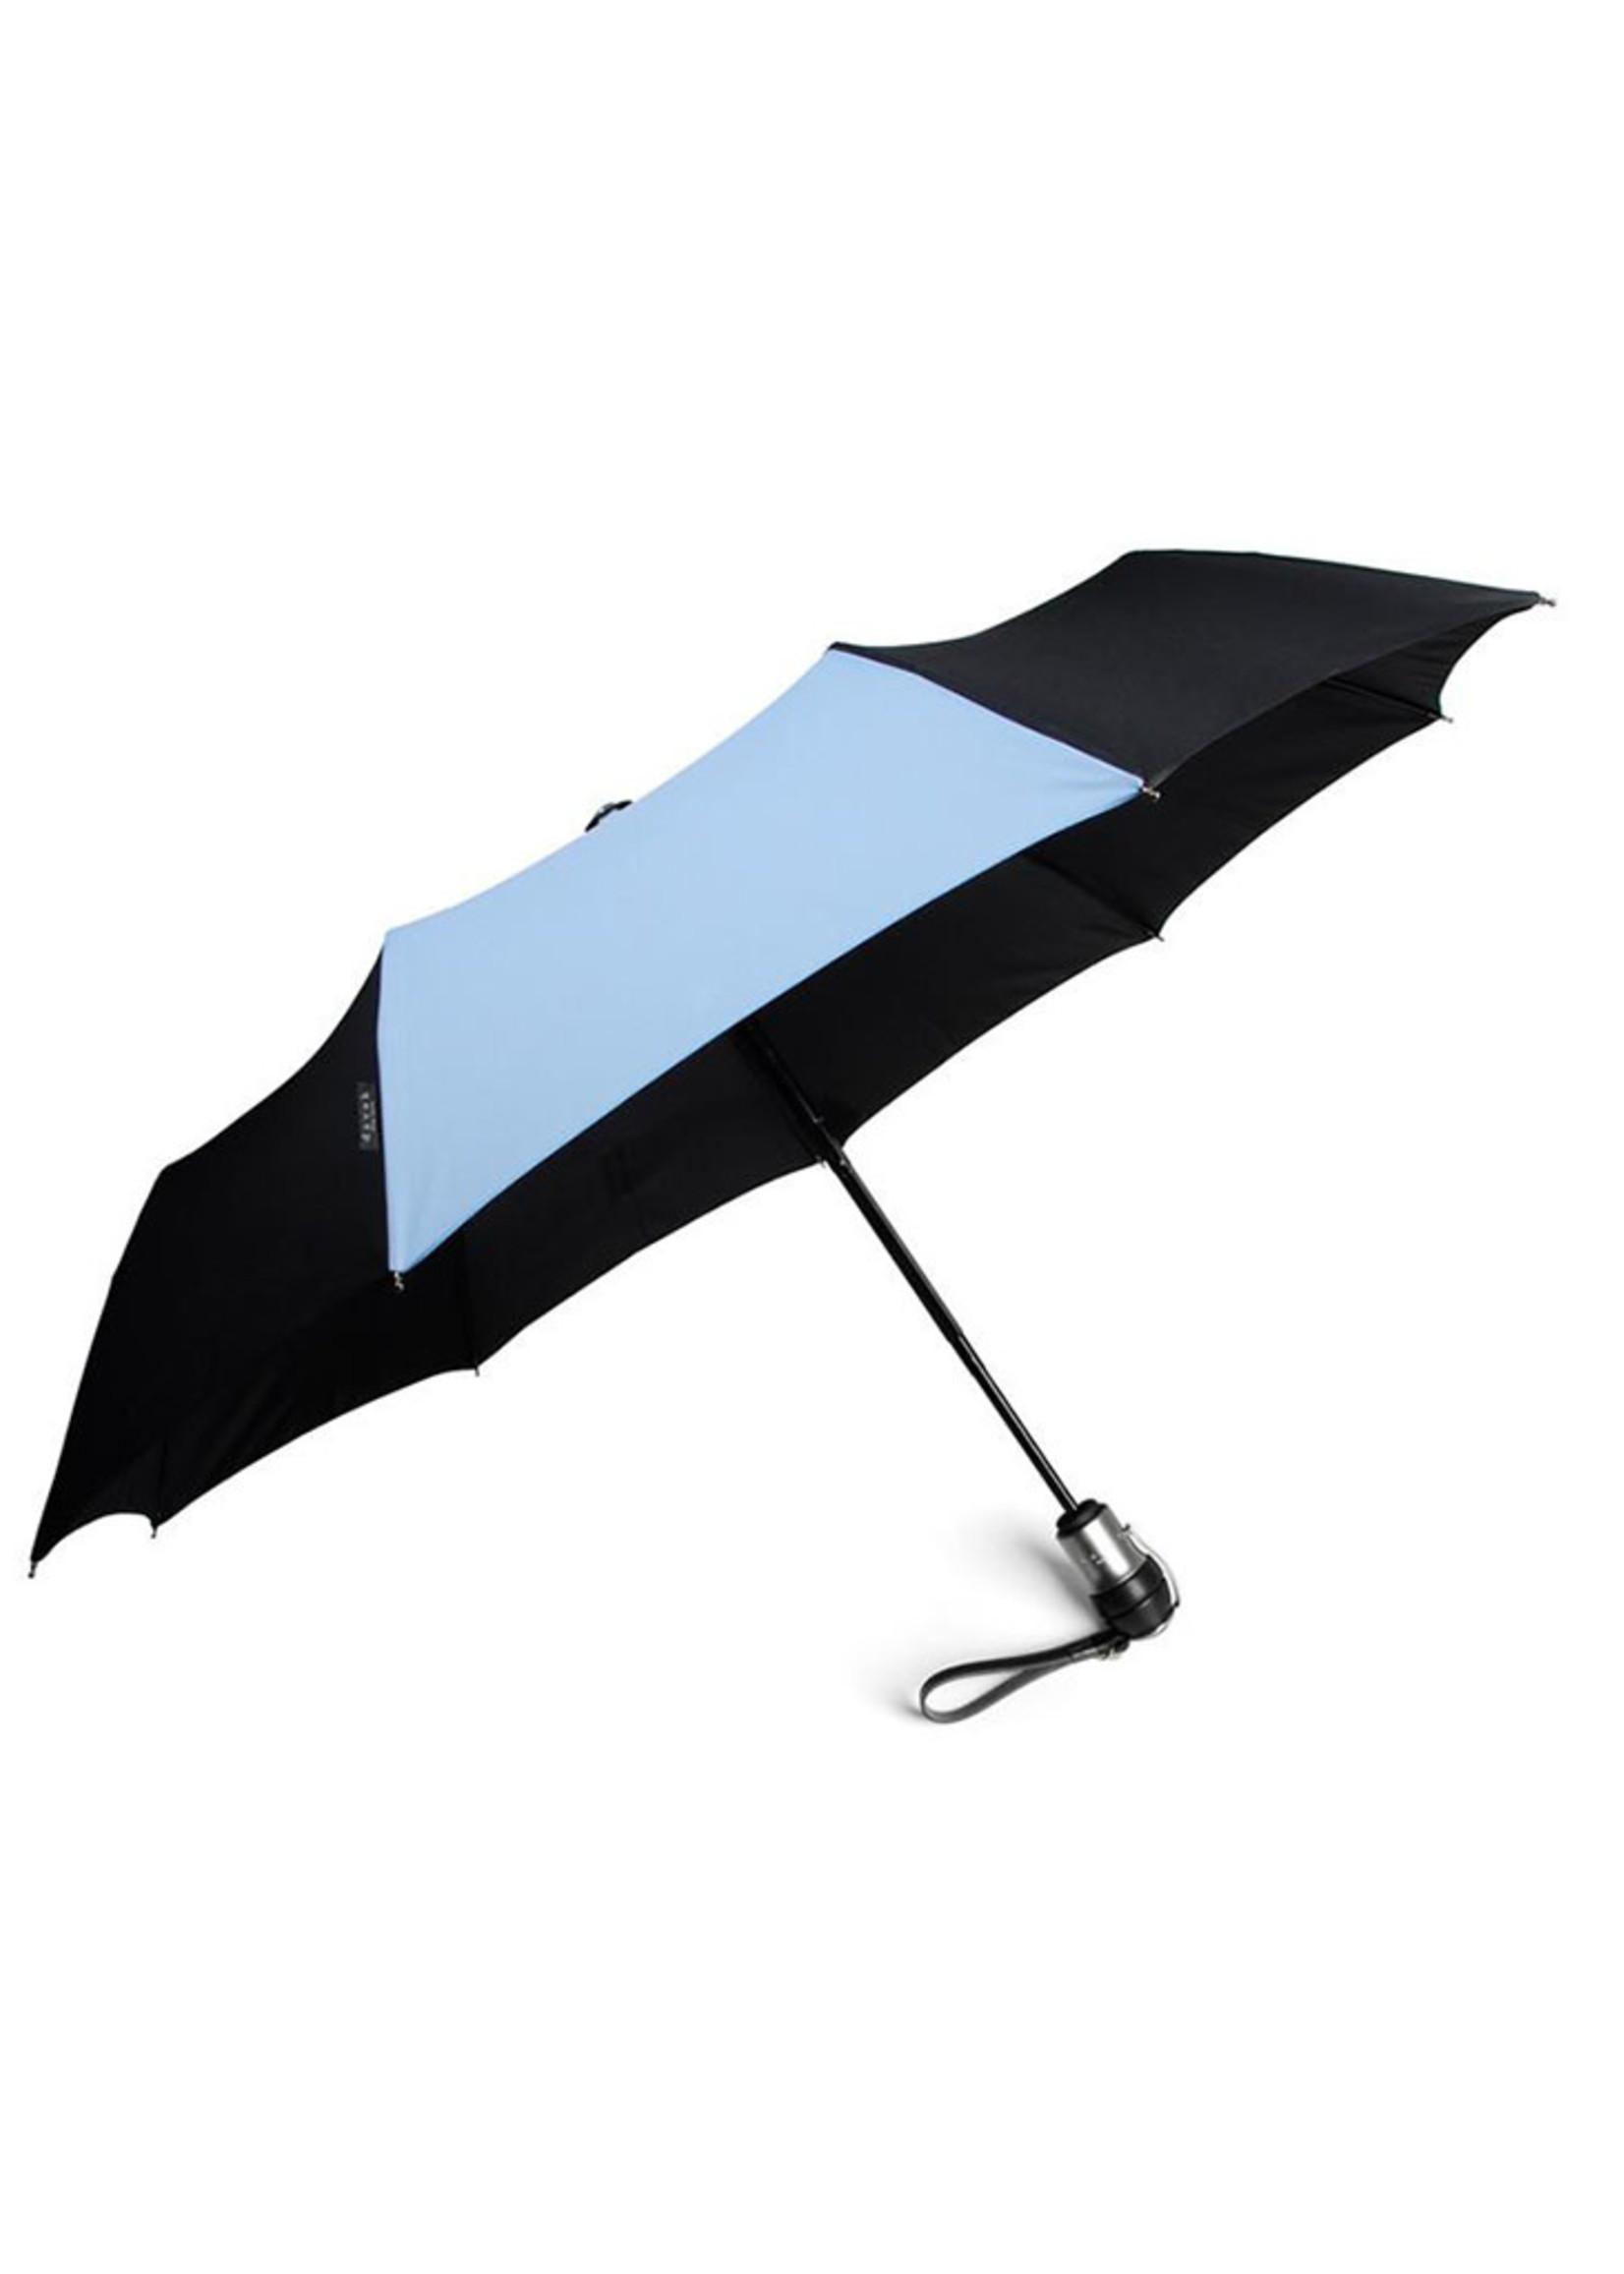 Solo Umbrella Pale Blue by Davek